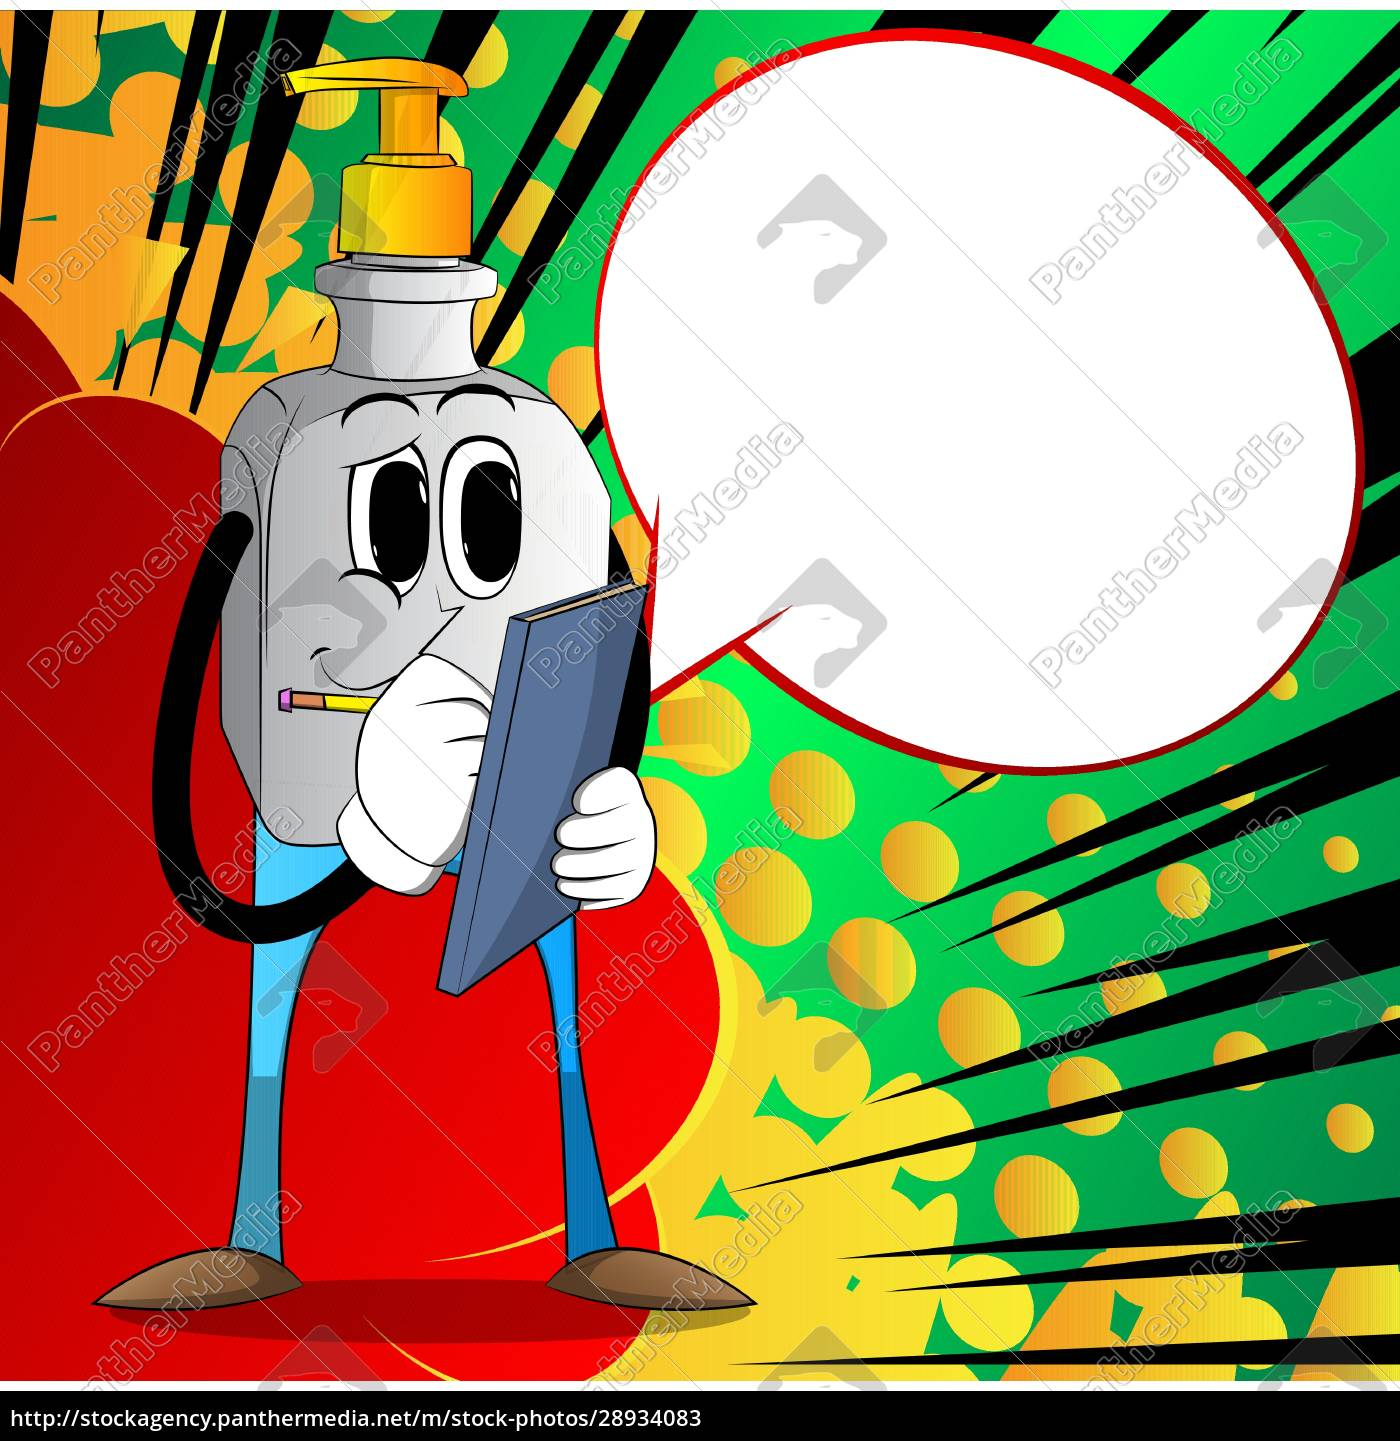 bottle, of, hand, sanitizer, gel, writing - 28934083